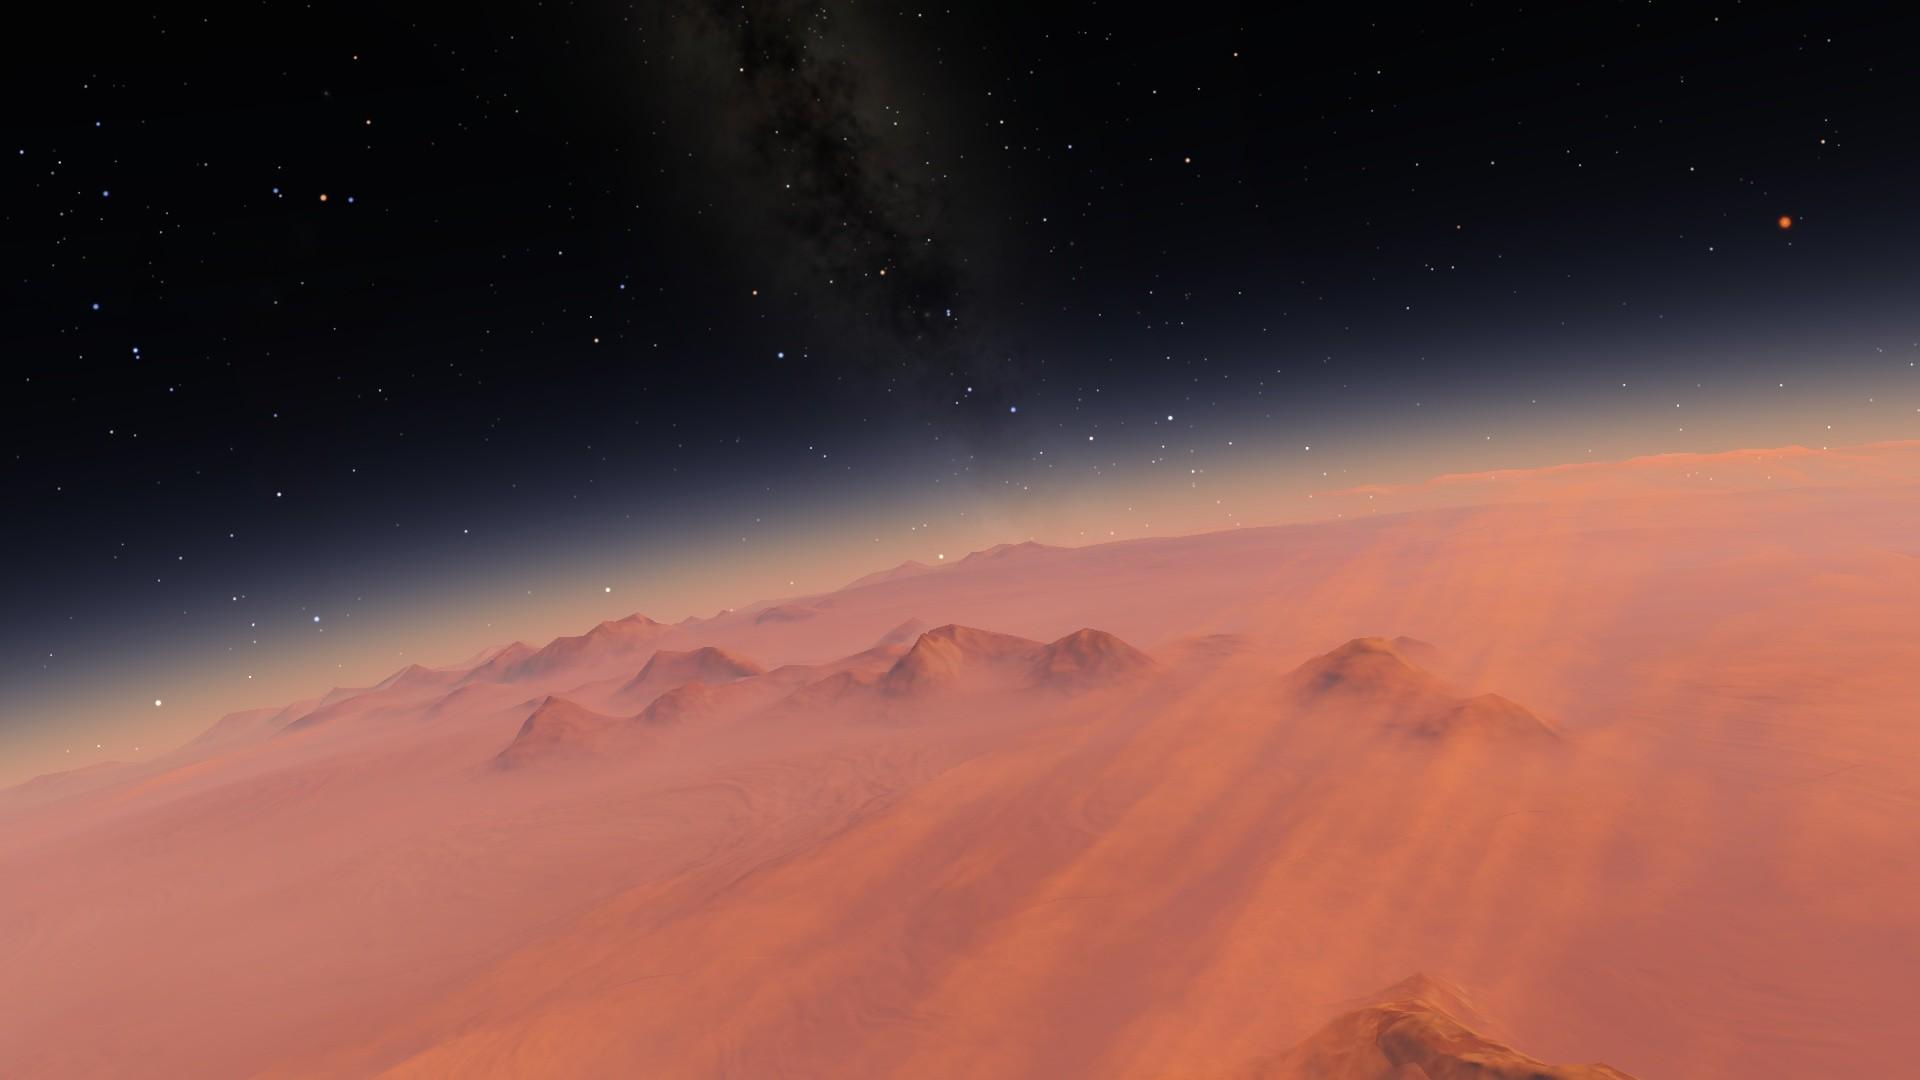 Wallpaper Digital Art Space Art Atmosphere Screenshot